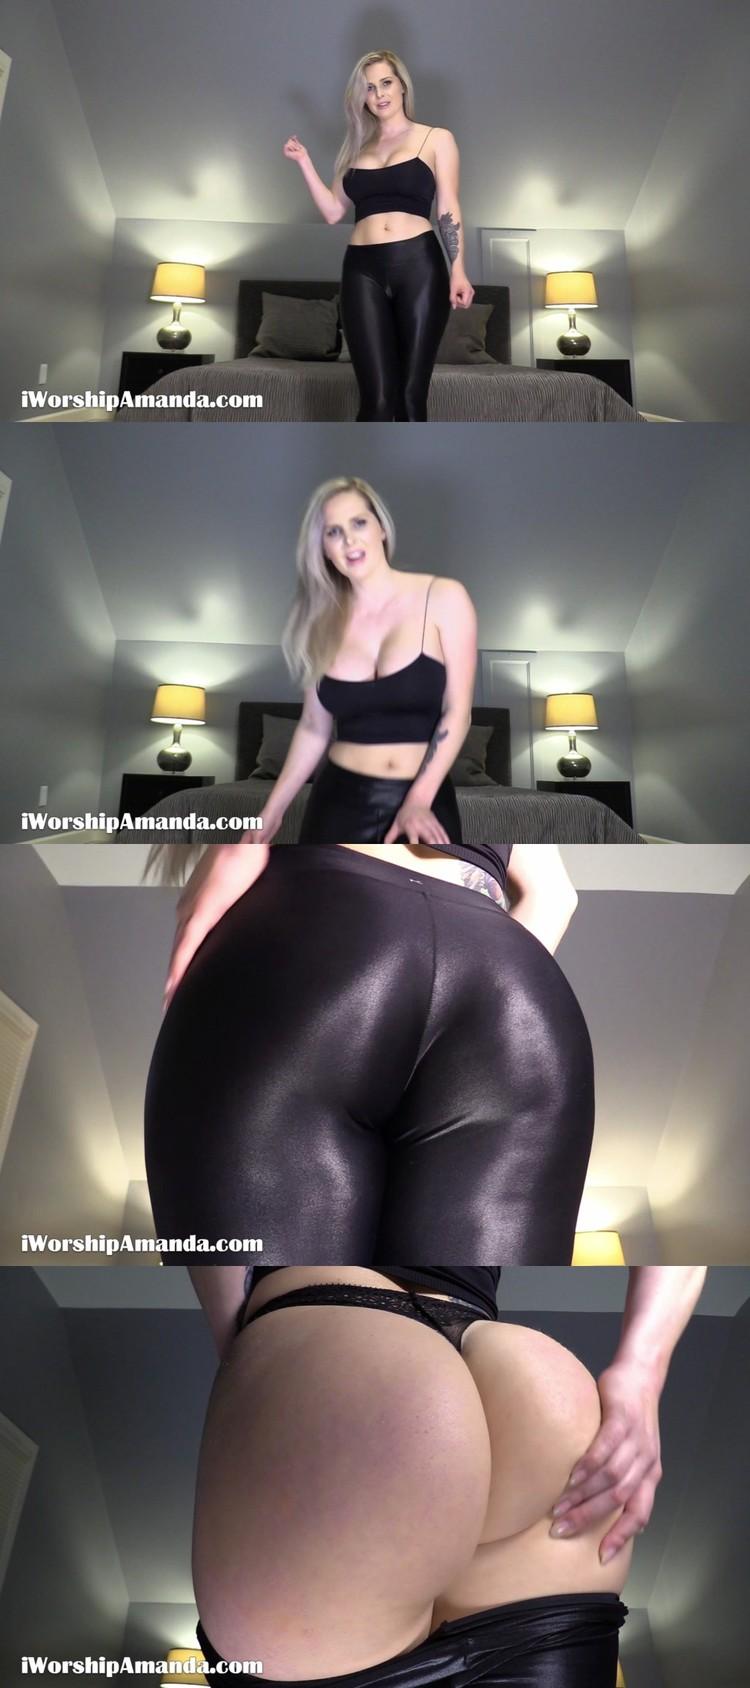 Alexa Rydell Yoga Girl Meditating Porn forumophilia - porn forum : sporty girls porn yoga pants and